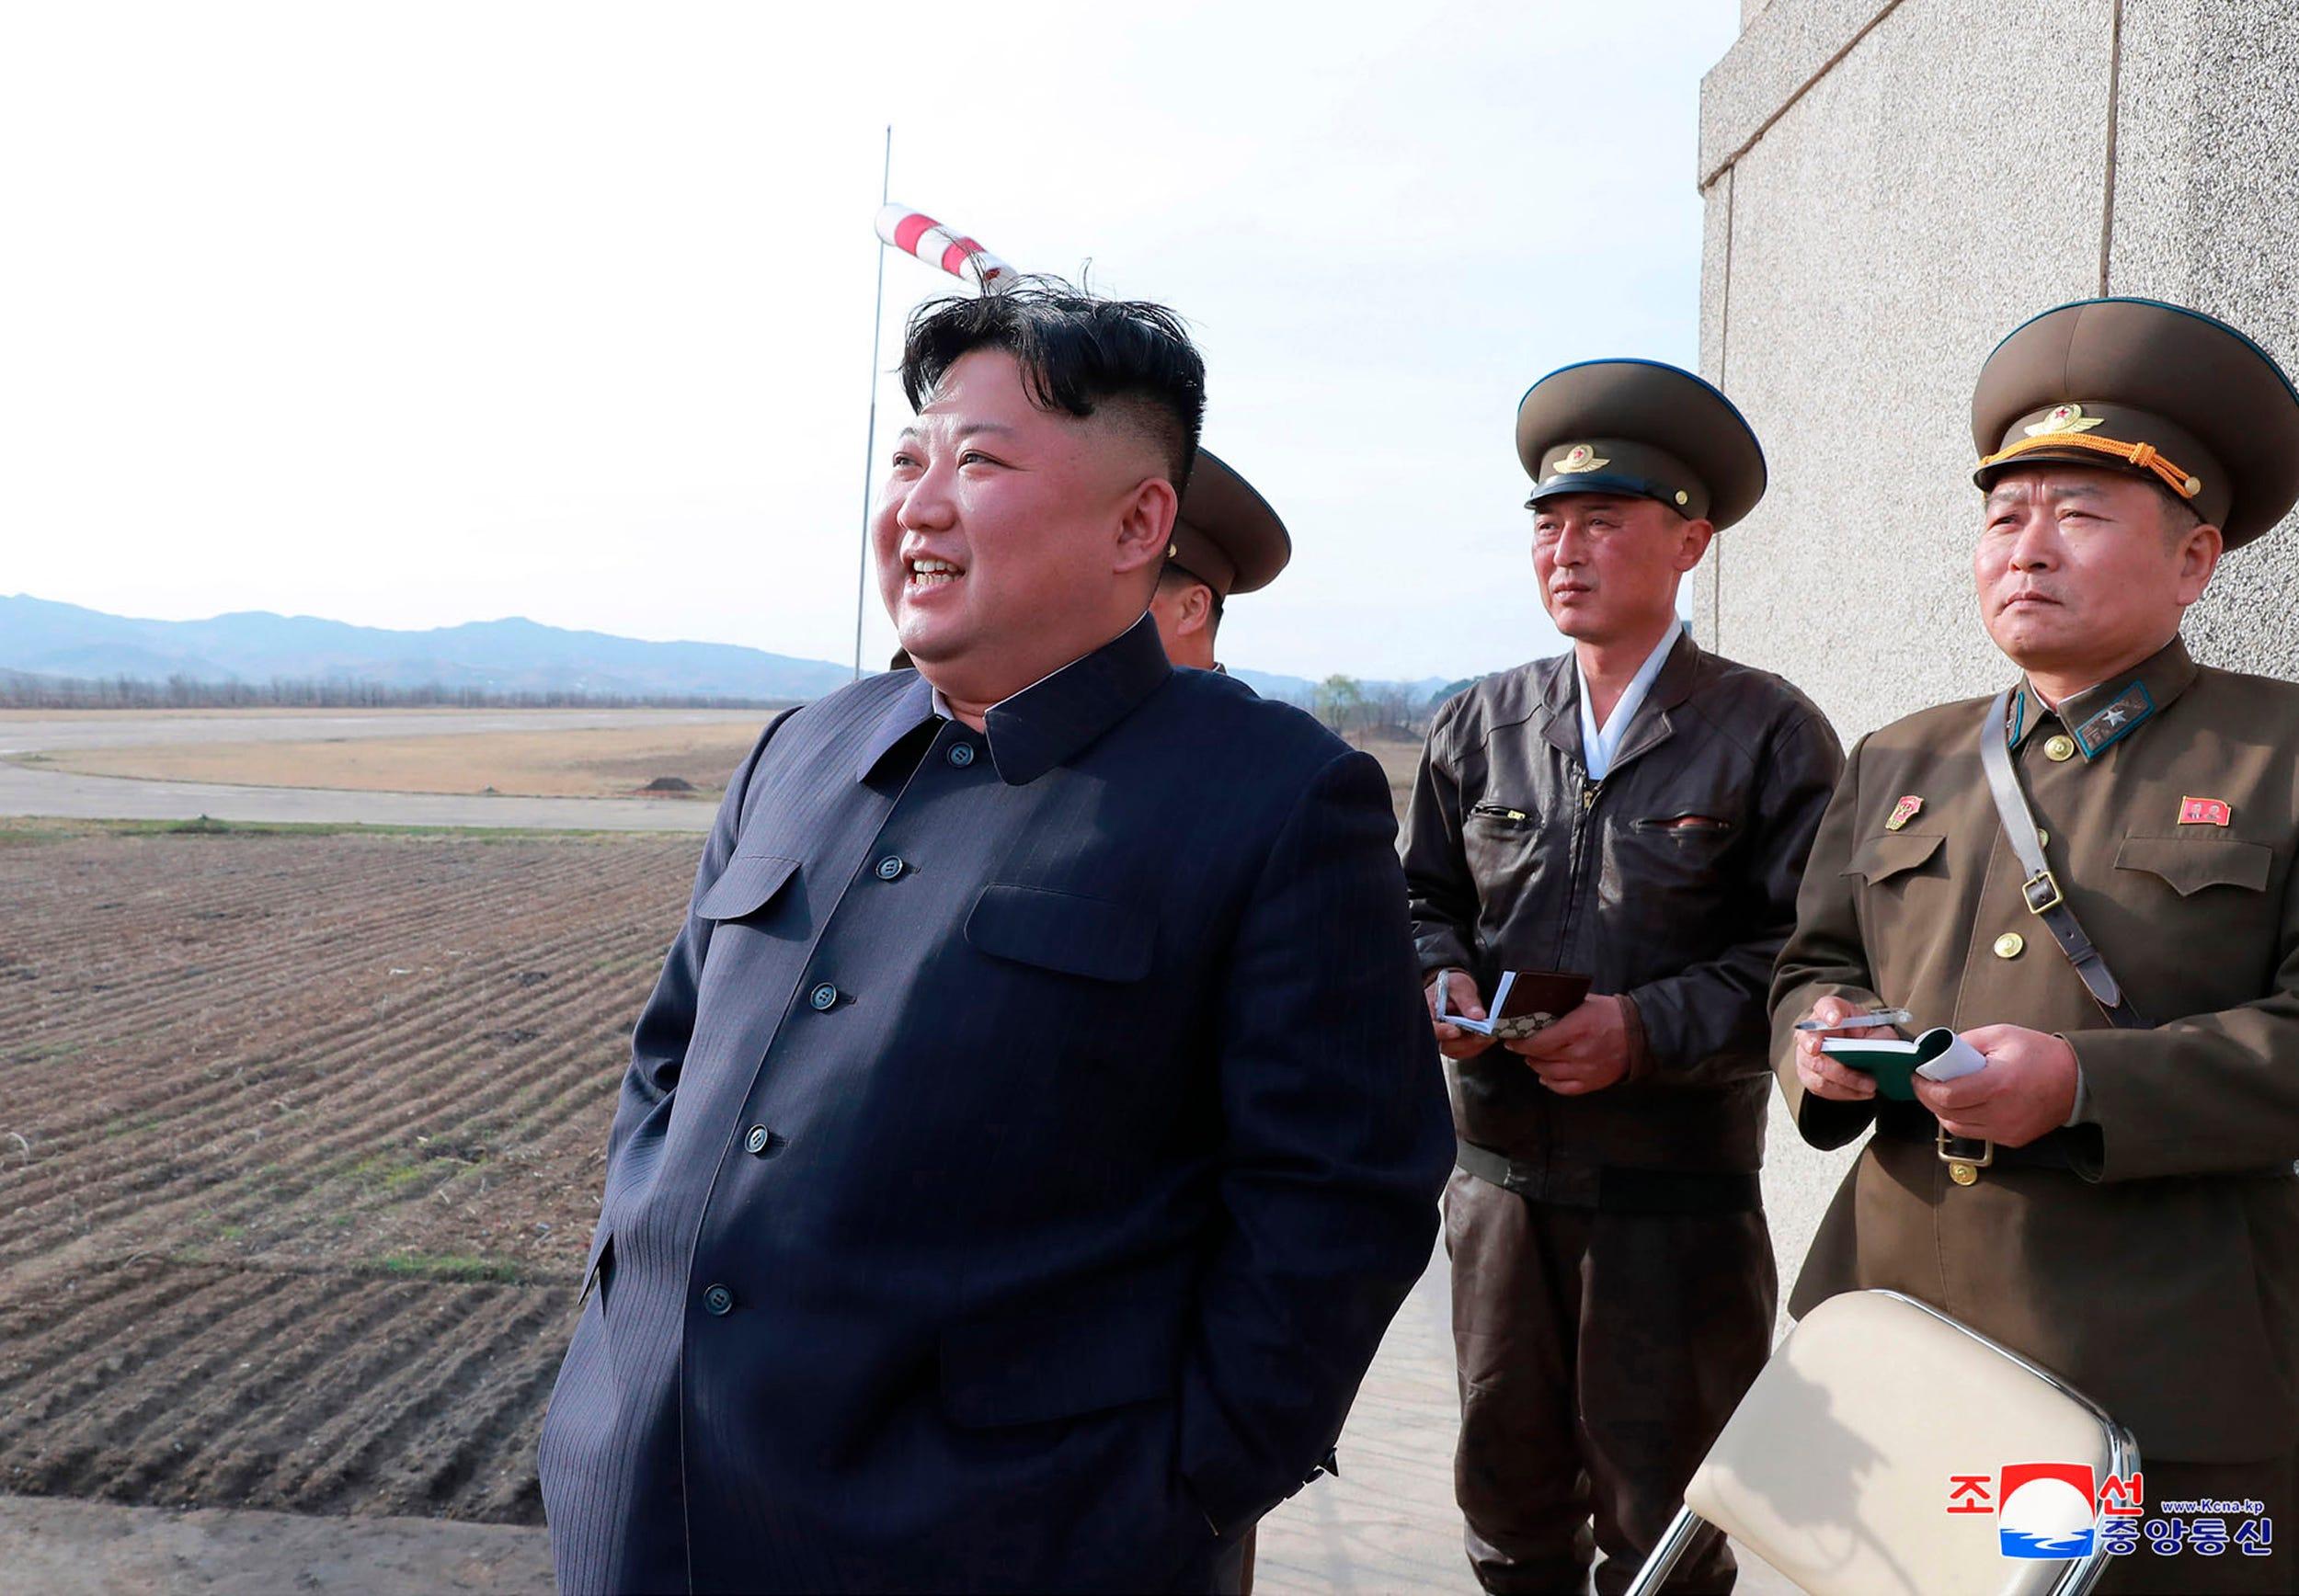 North Korea leader Kim Jong Un will visit Russia for summit with Vladimir Putin on Thursday